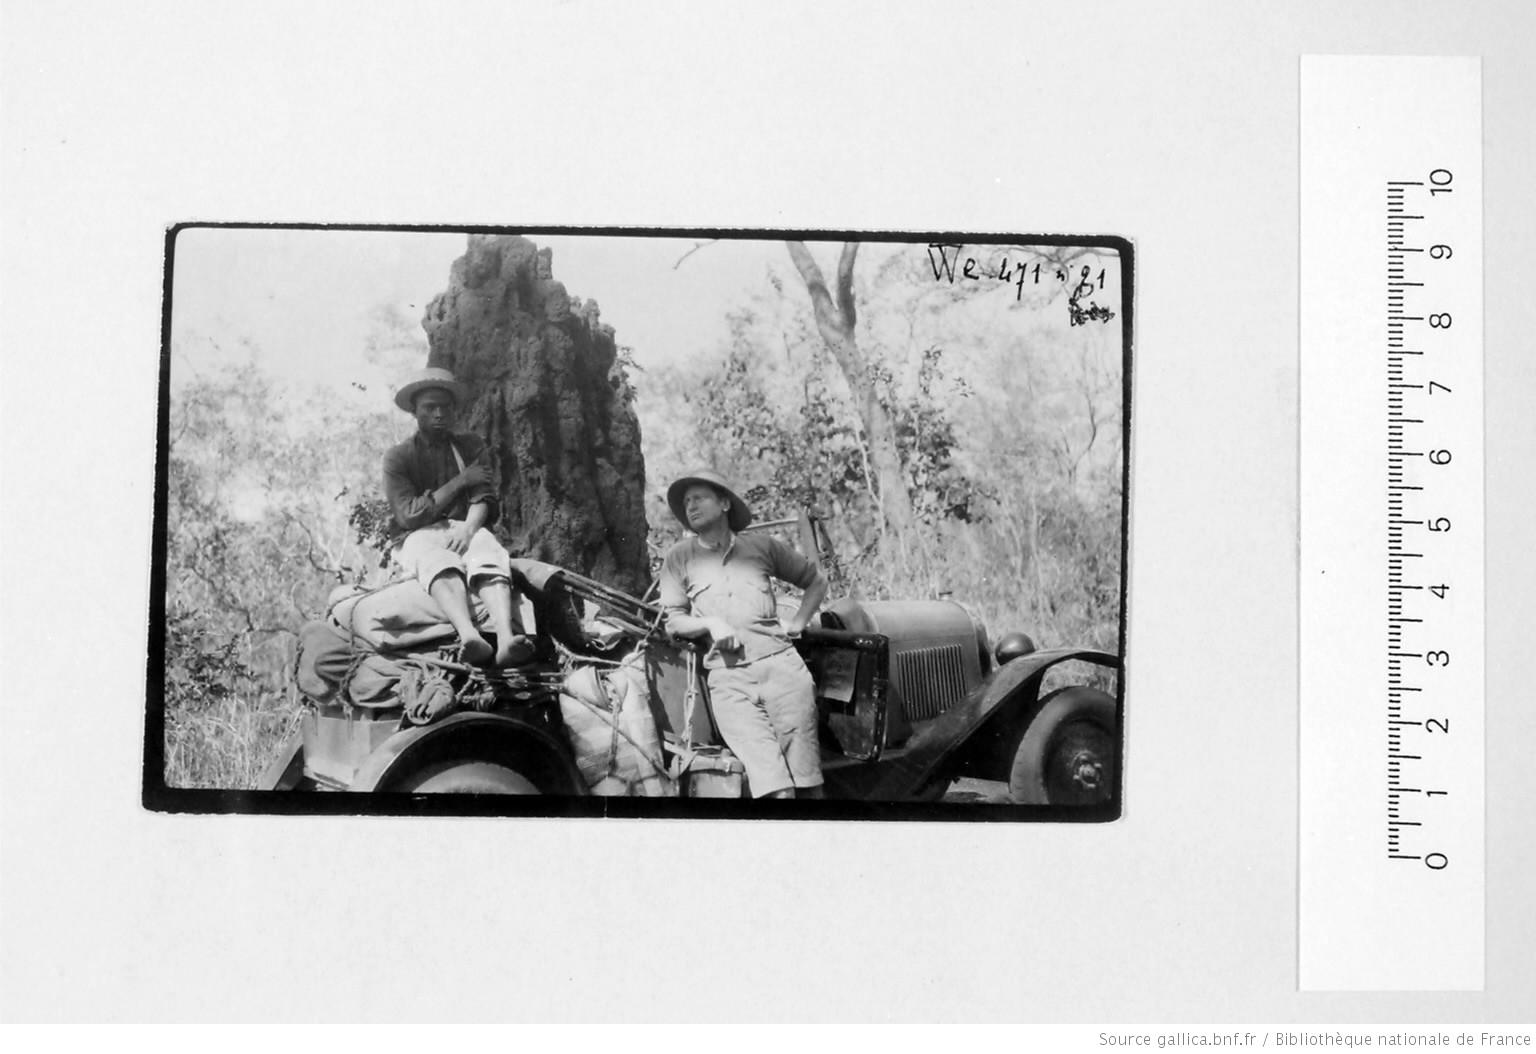 [39 phot. d'A.E.F. en 1924. Enregistré en 1936] - 29